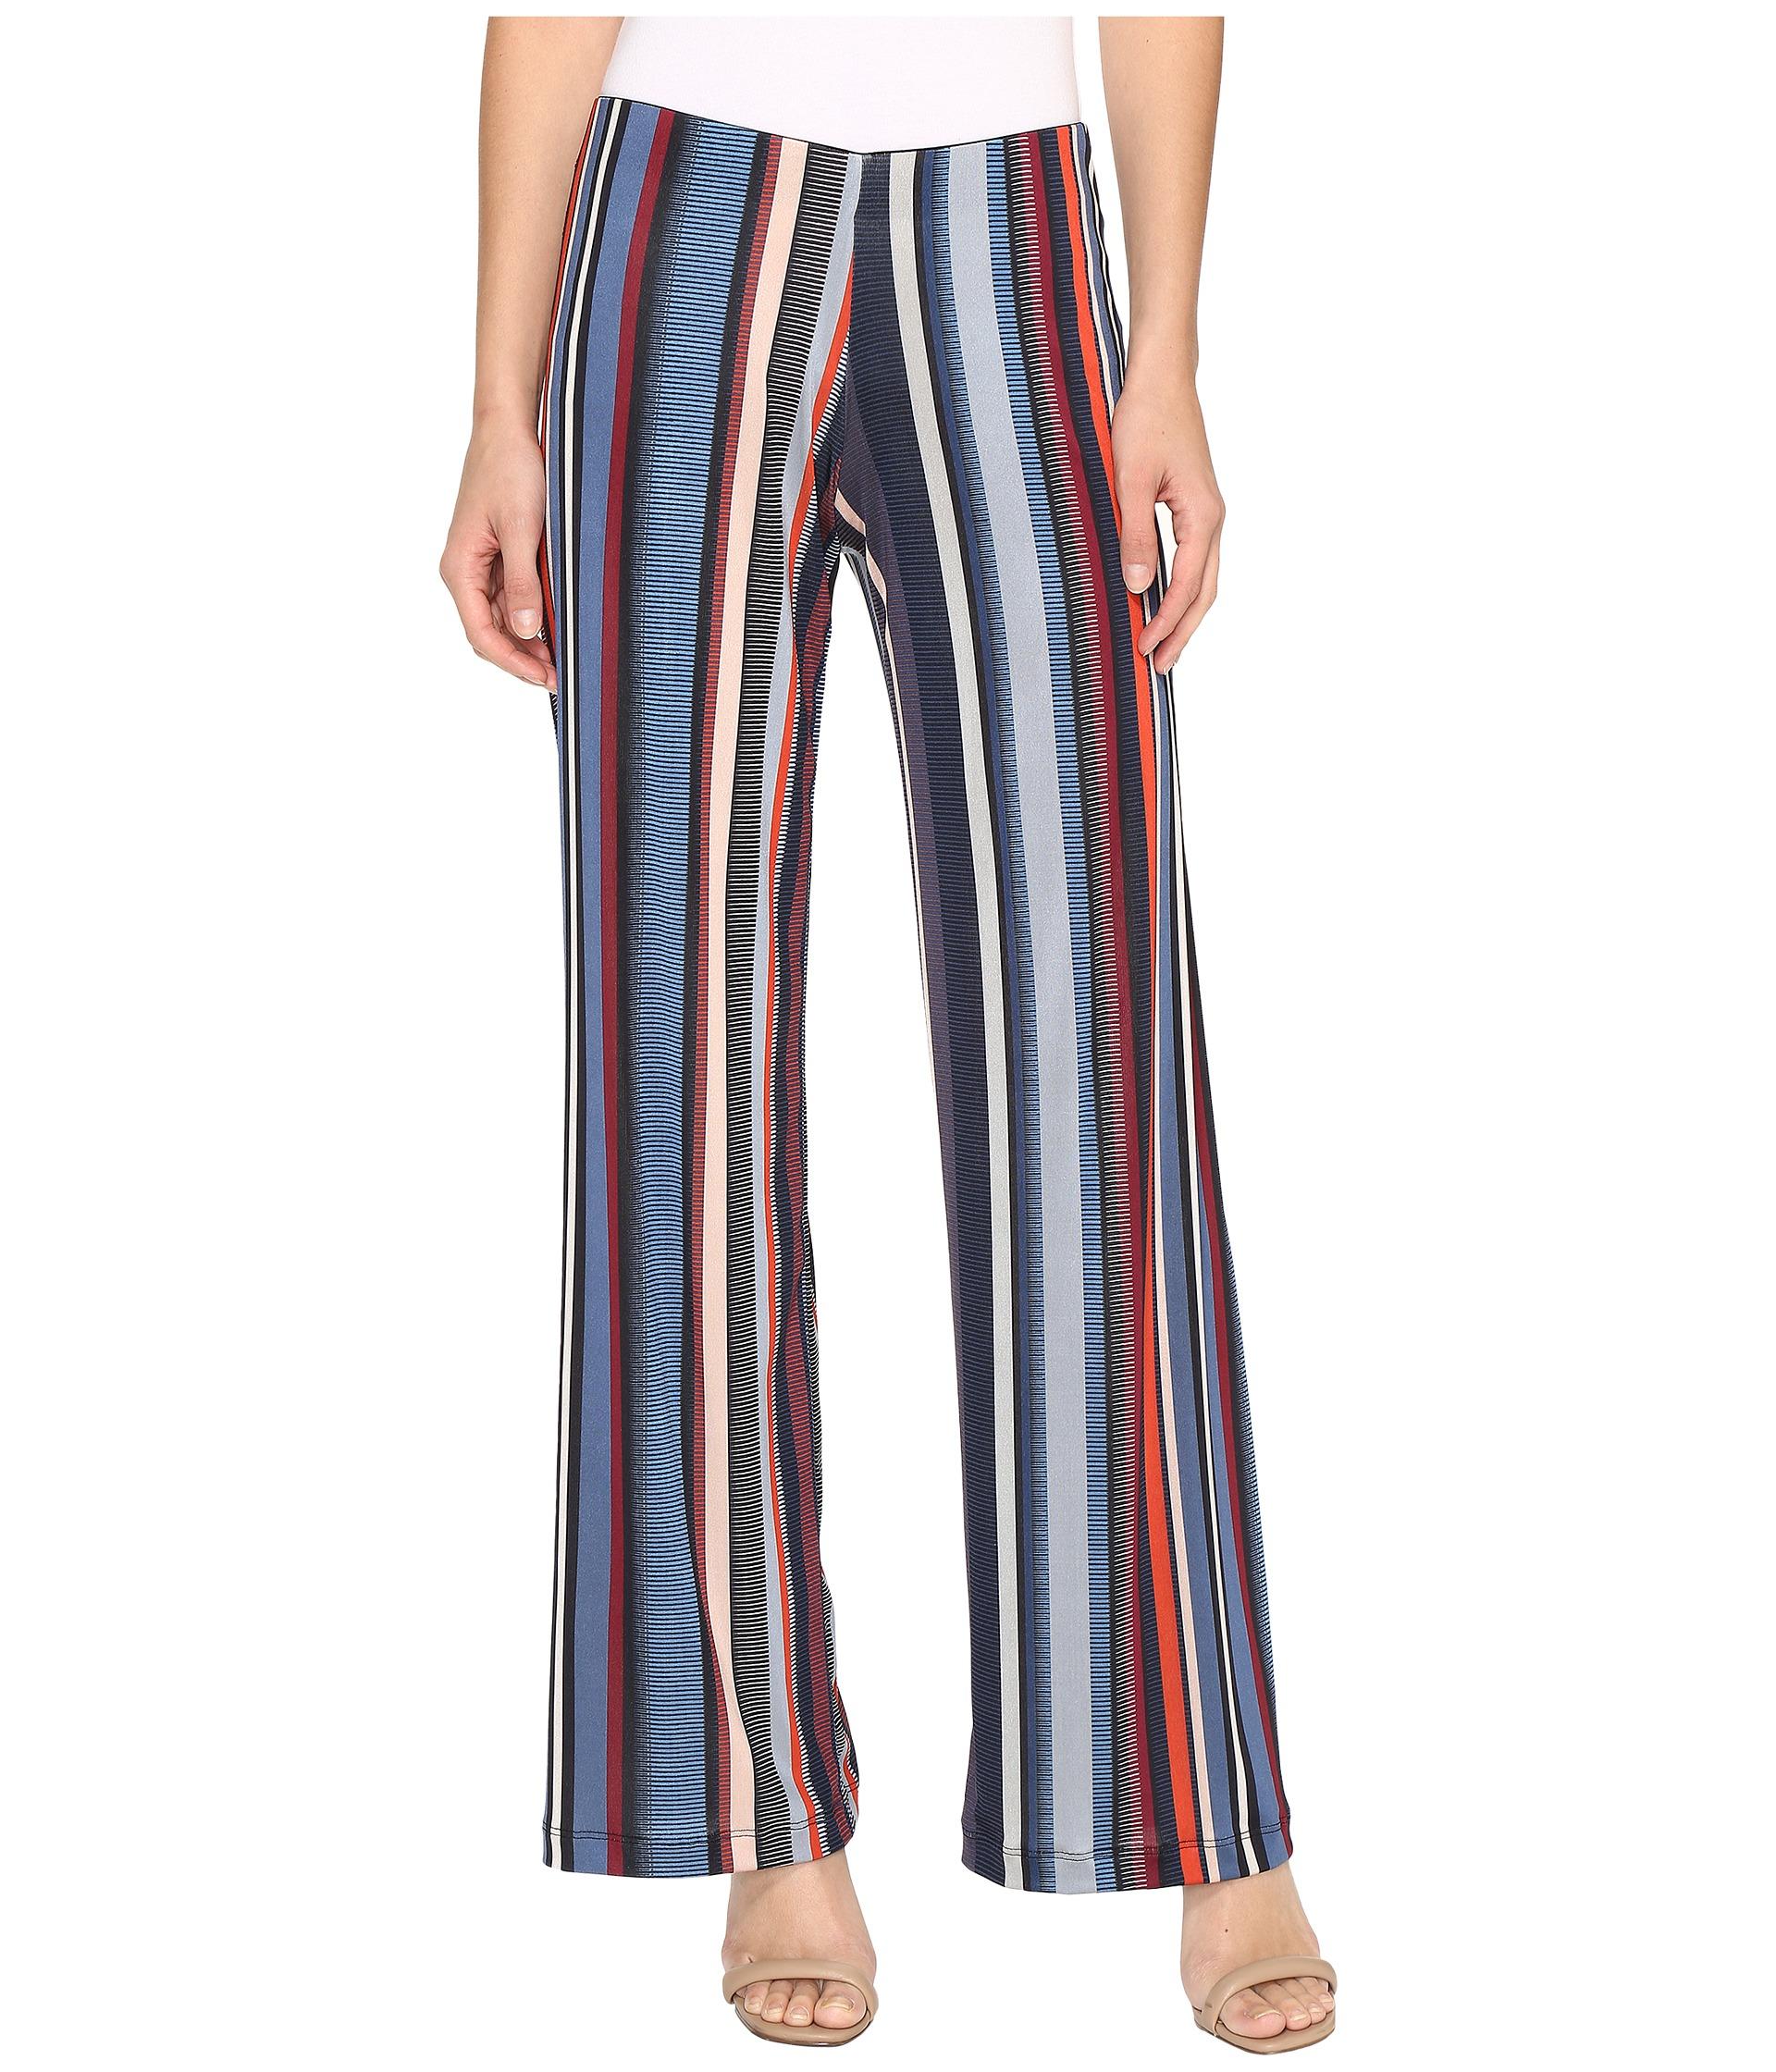 Amazoncom: mens striped pants